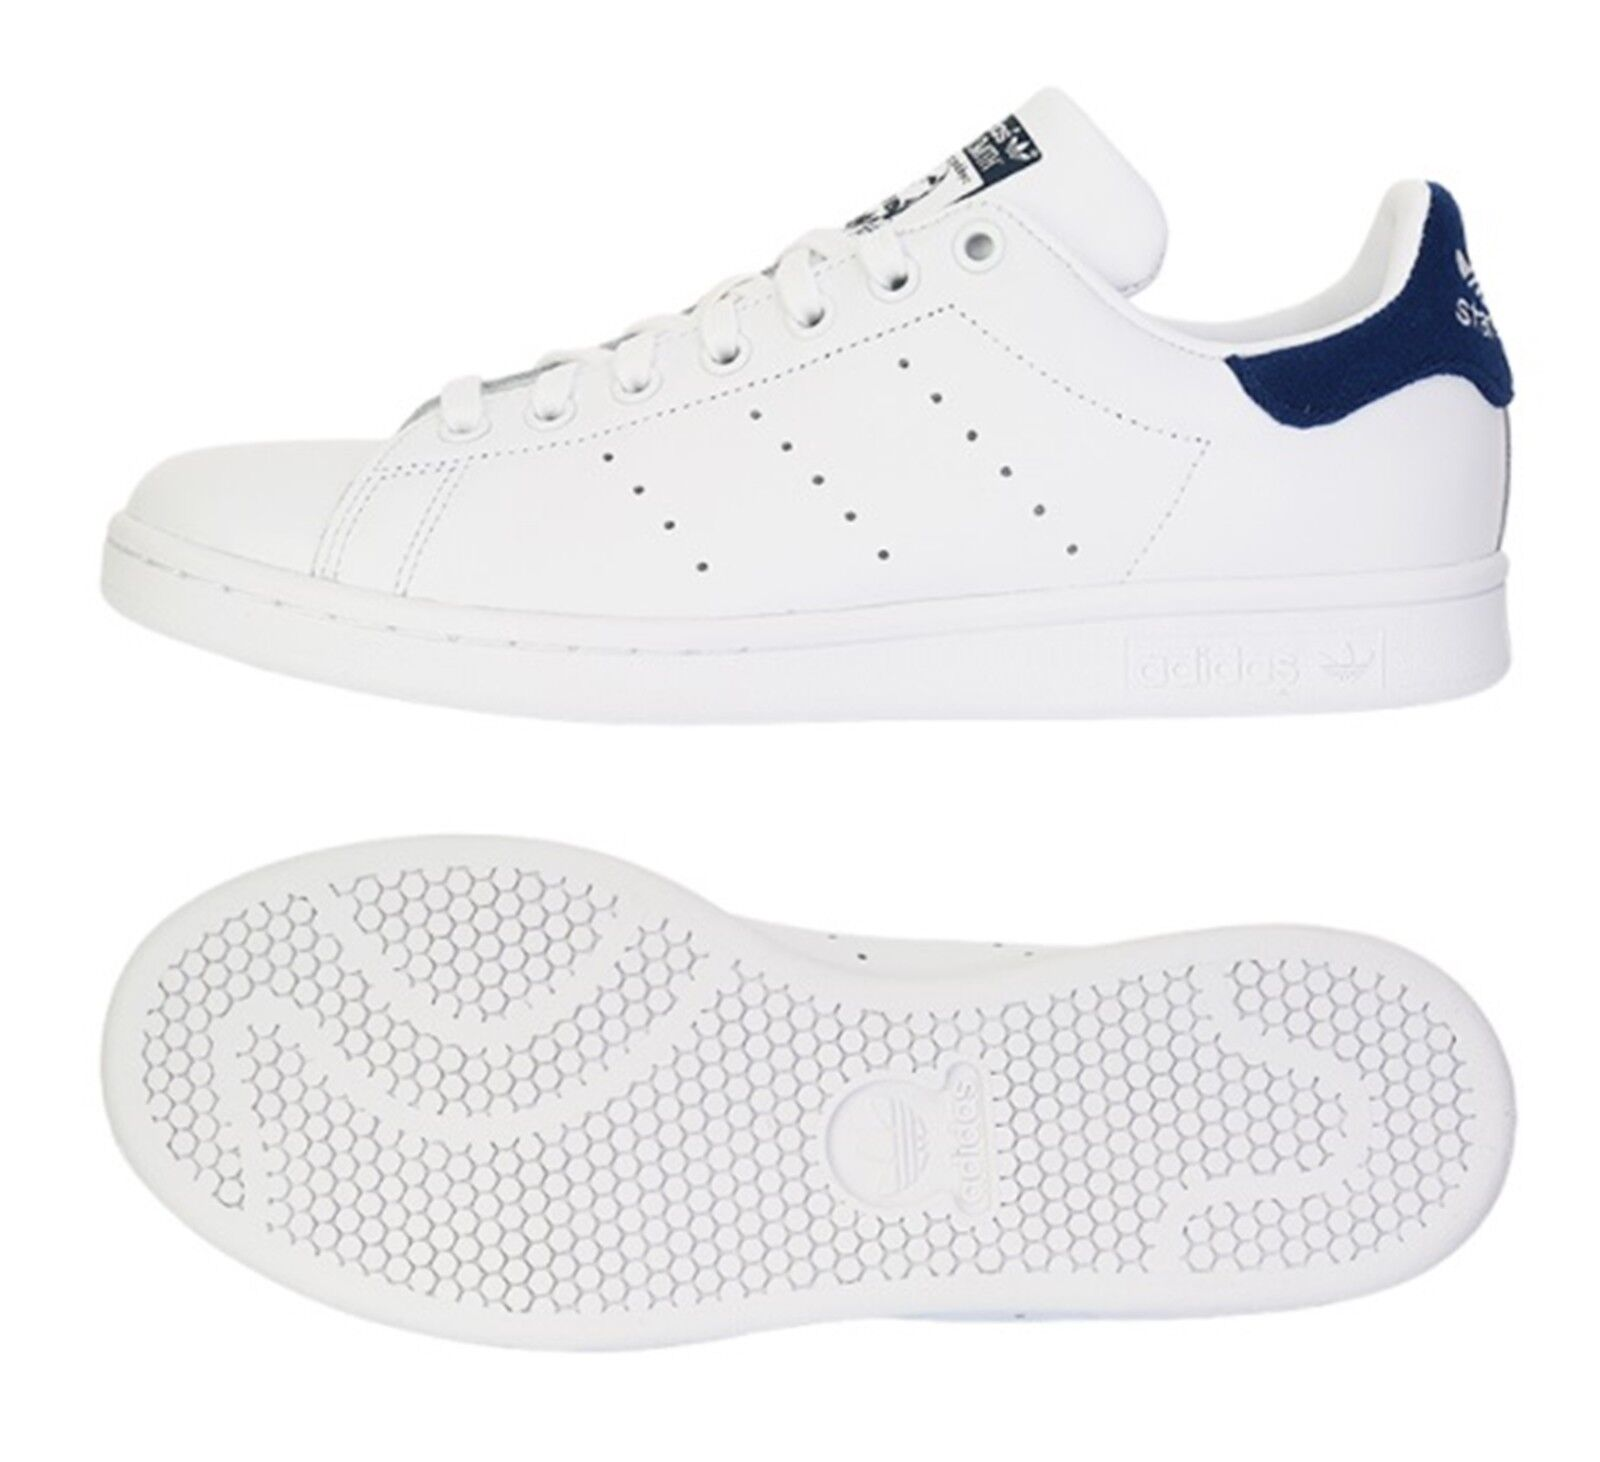 Adidas Men Originals Stan Smith Training shoes White Running GYM Sneakers BZ0483